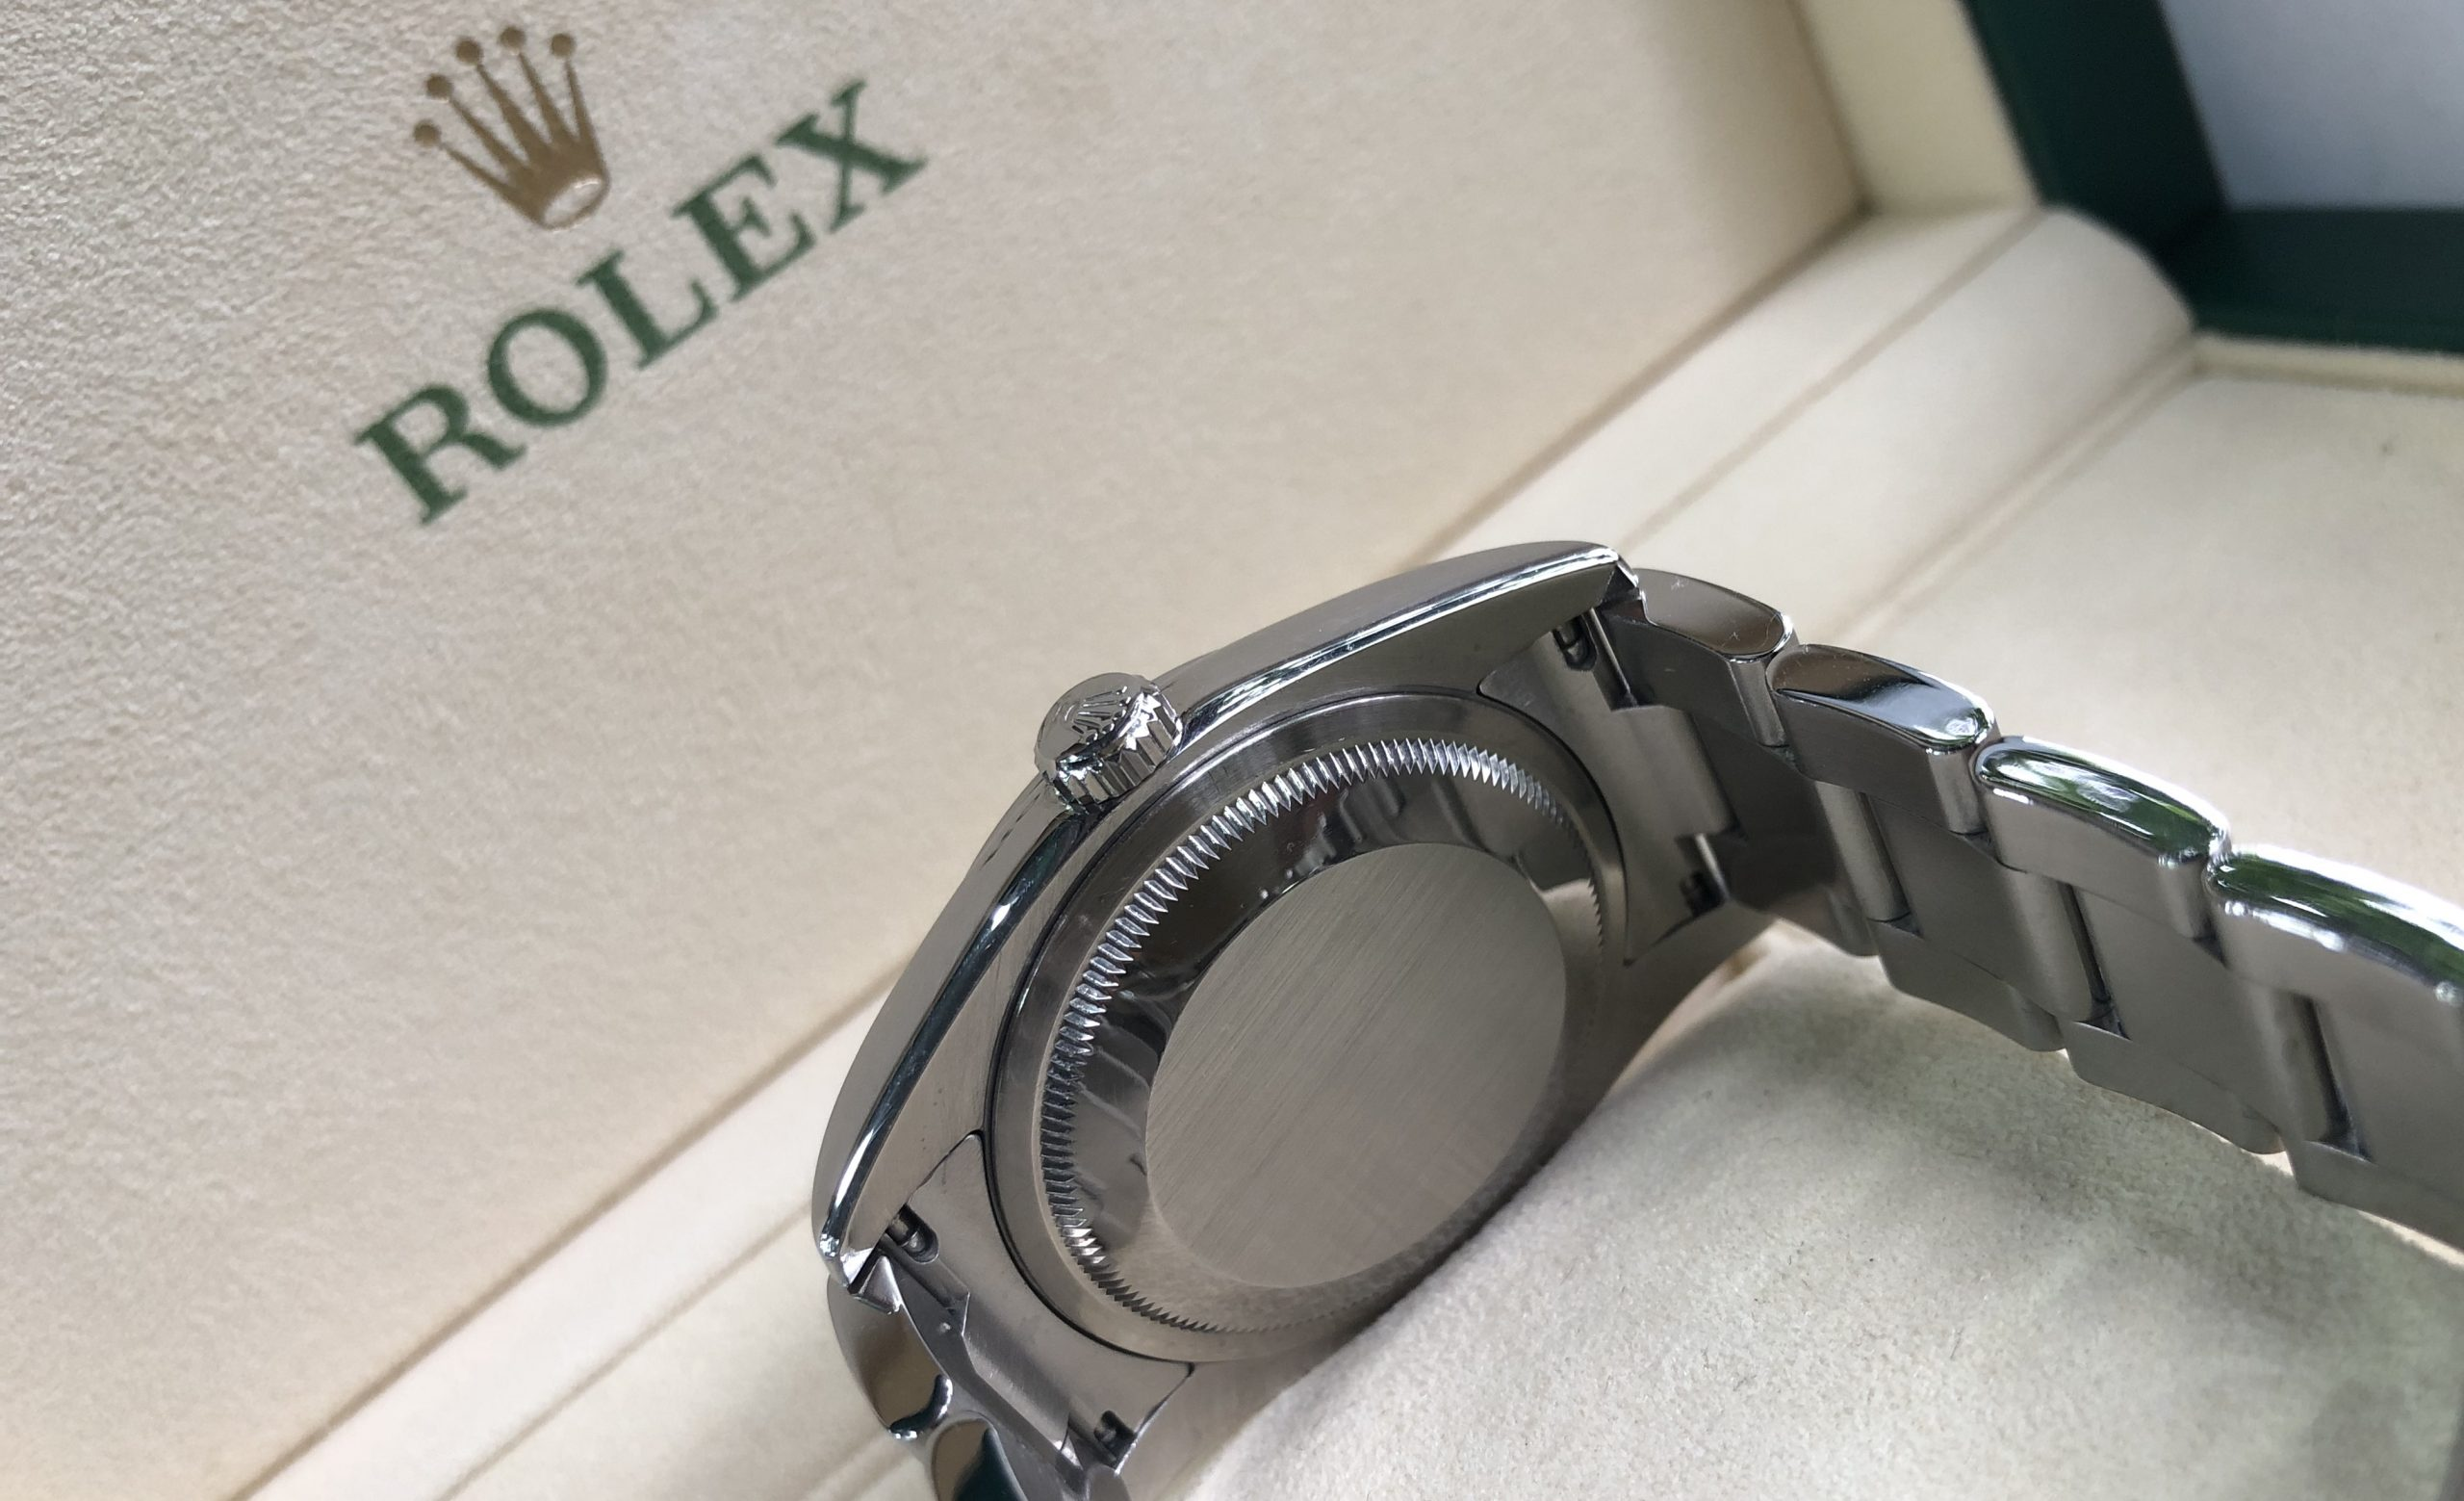 Rolex Datejust Ref.116200 mặt hoa đào đời 2011